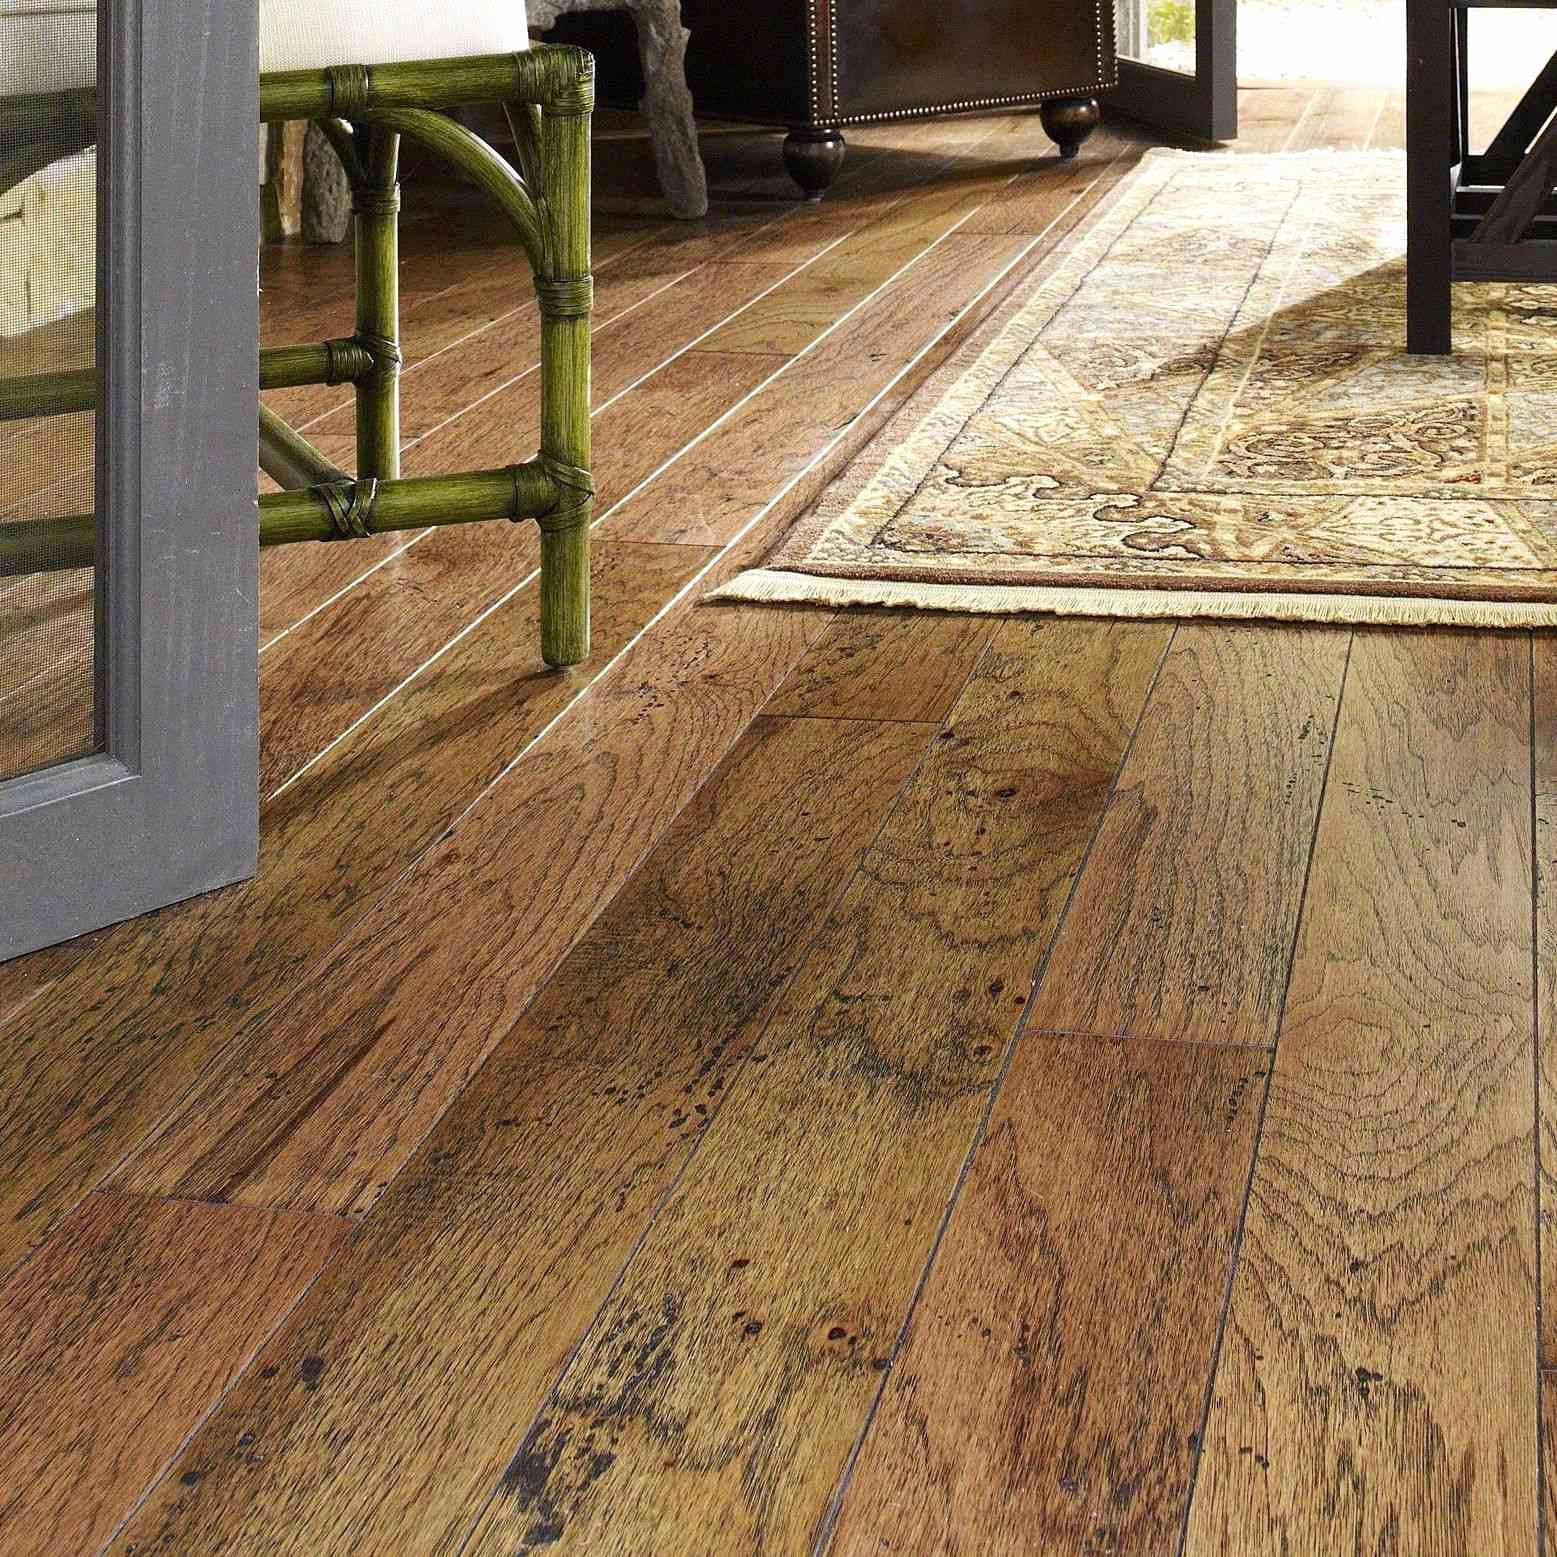 the hardwood flooring store of hardwood store floor plan ideas with hardwood floor designs new best type wood flooring best floor floor wood floor wood 0d